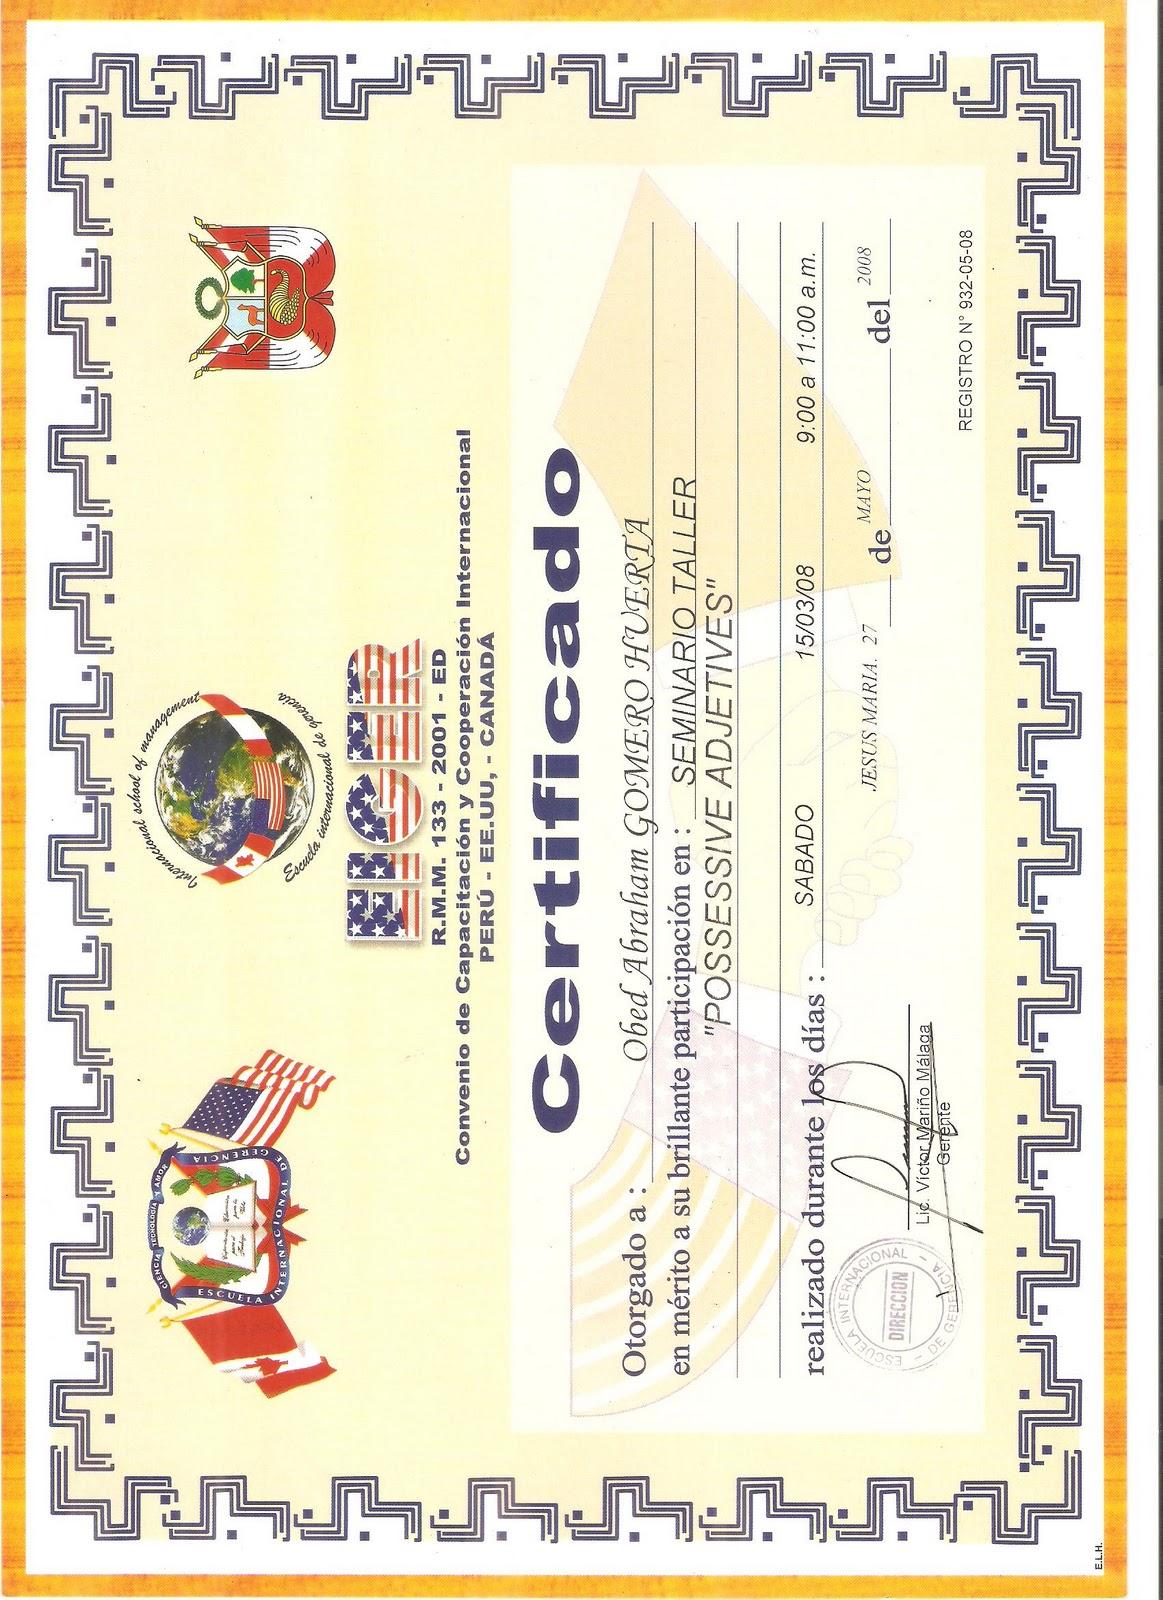 Supervisor de seguridad de fima peruacute en carmen de la leguareynoso - 5 5